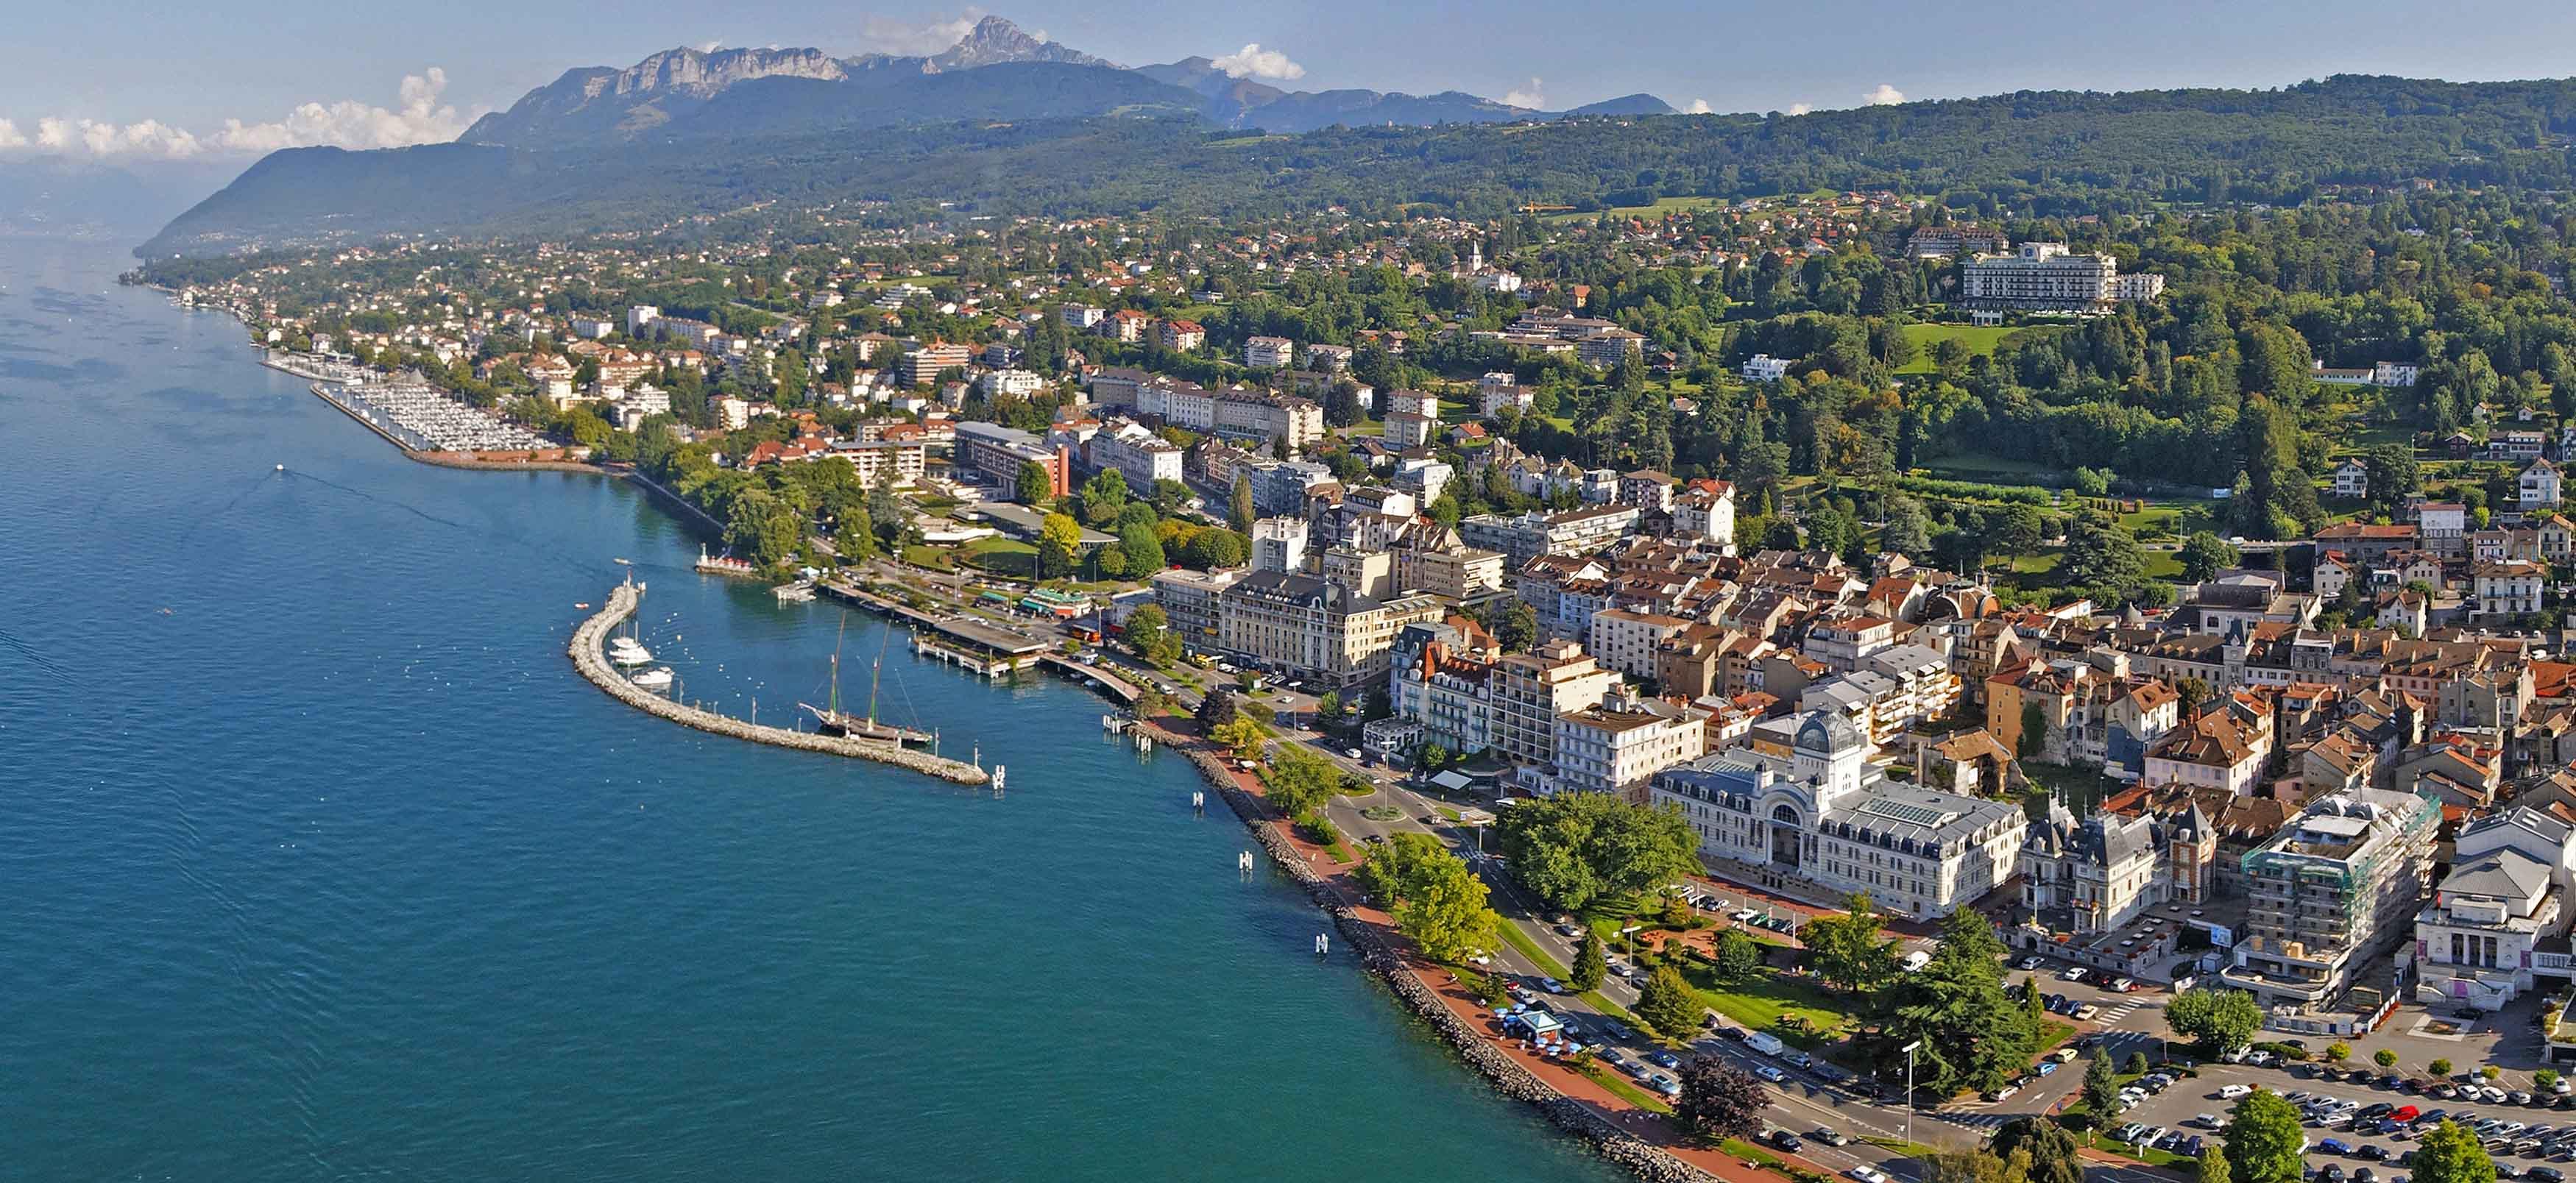 Hotel De France Evian Les Bains